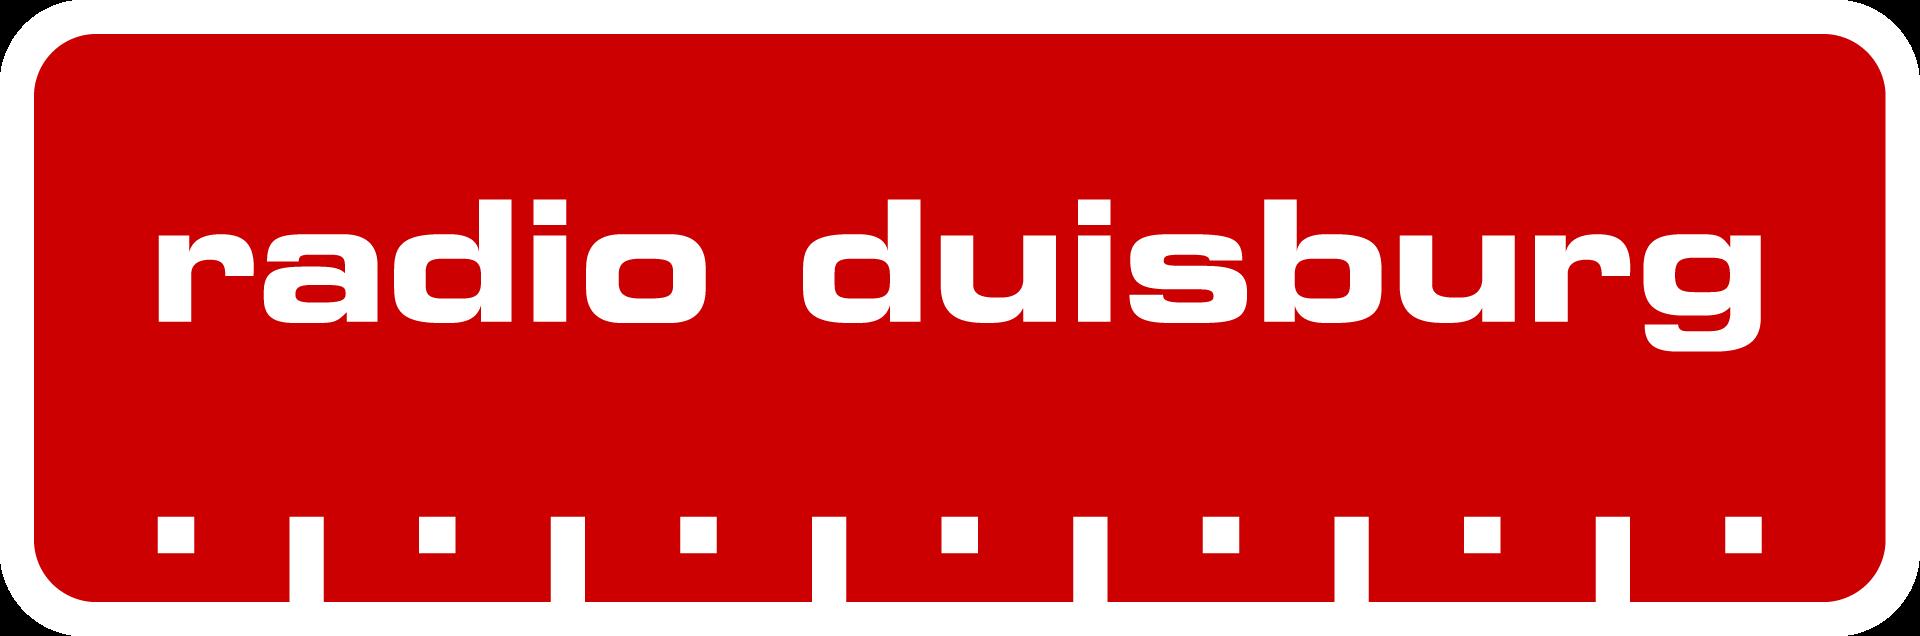 radio duisburg news